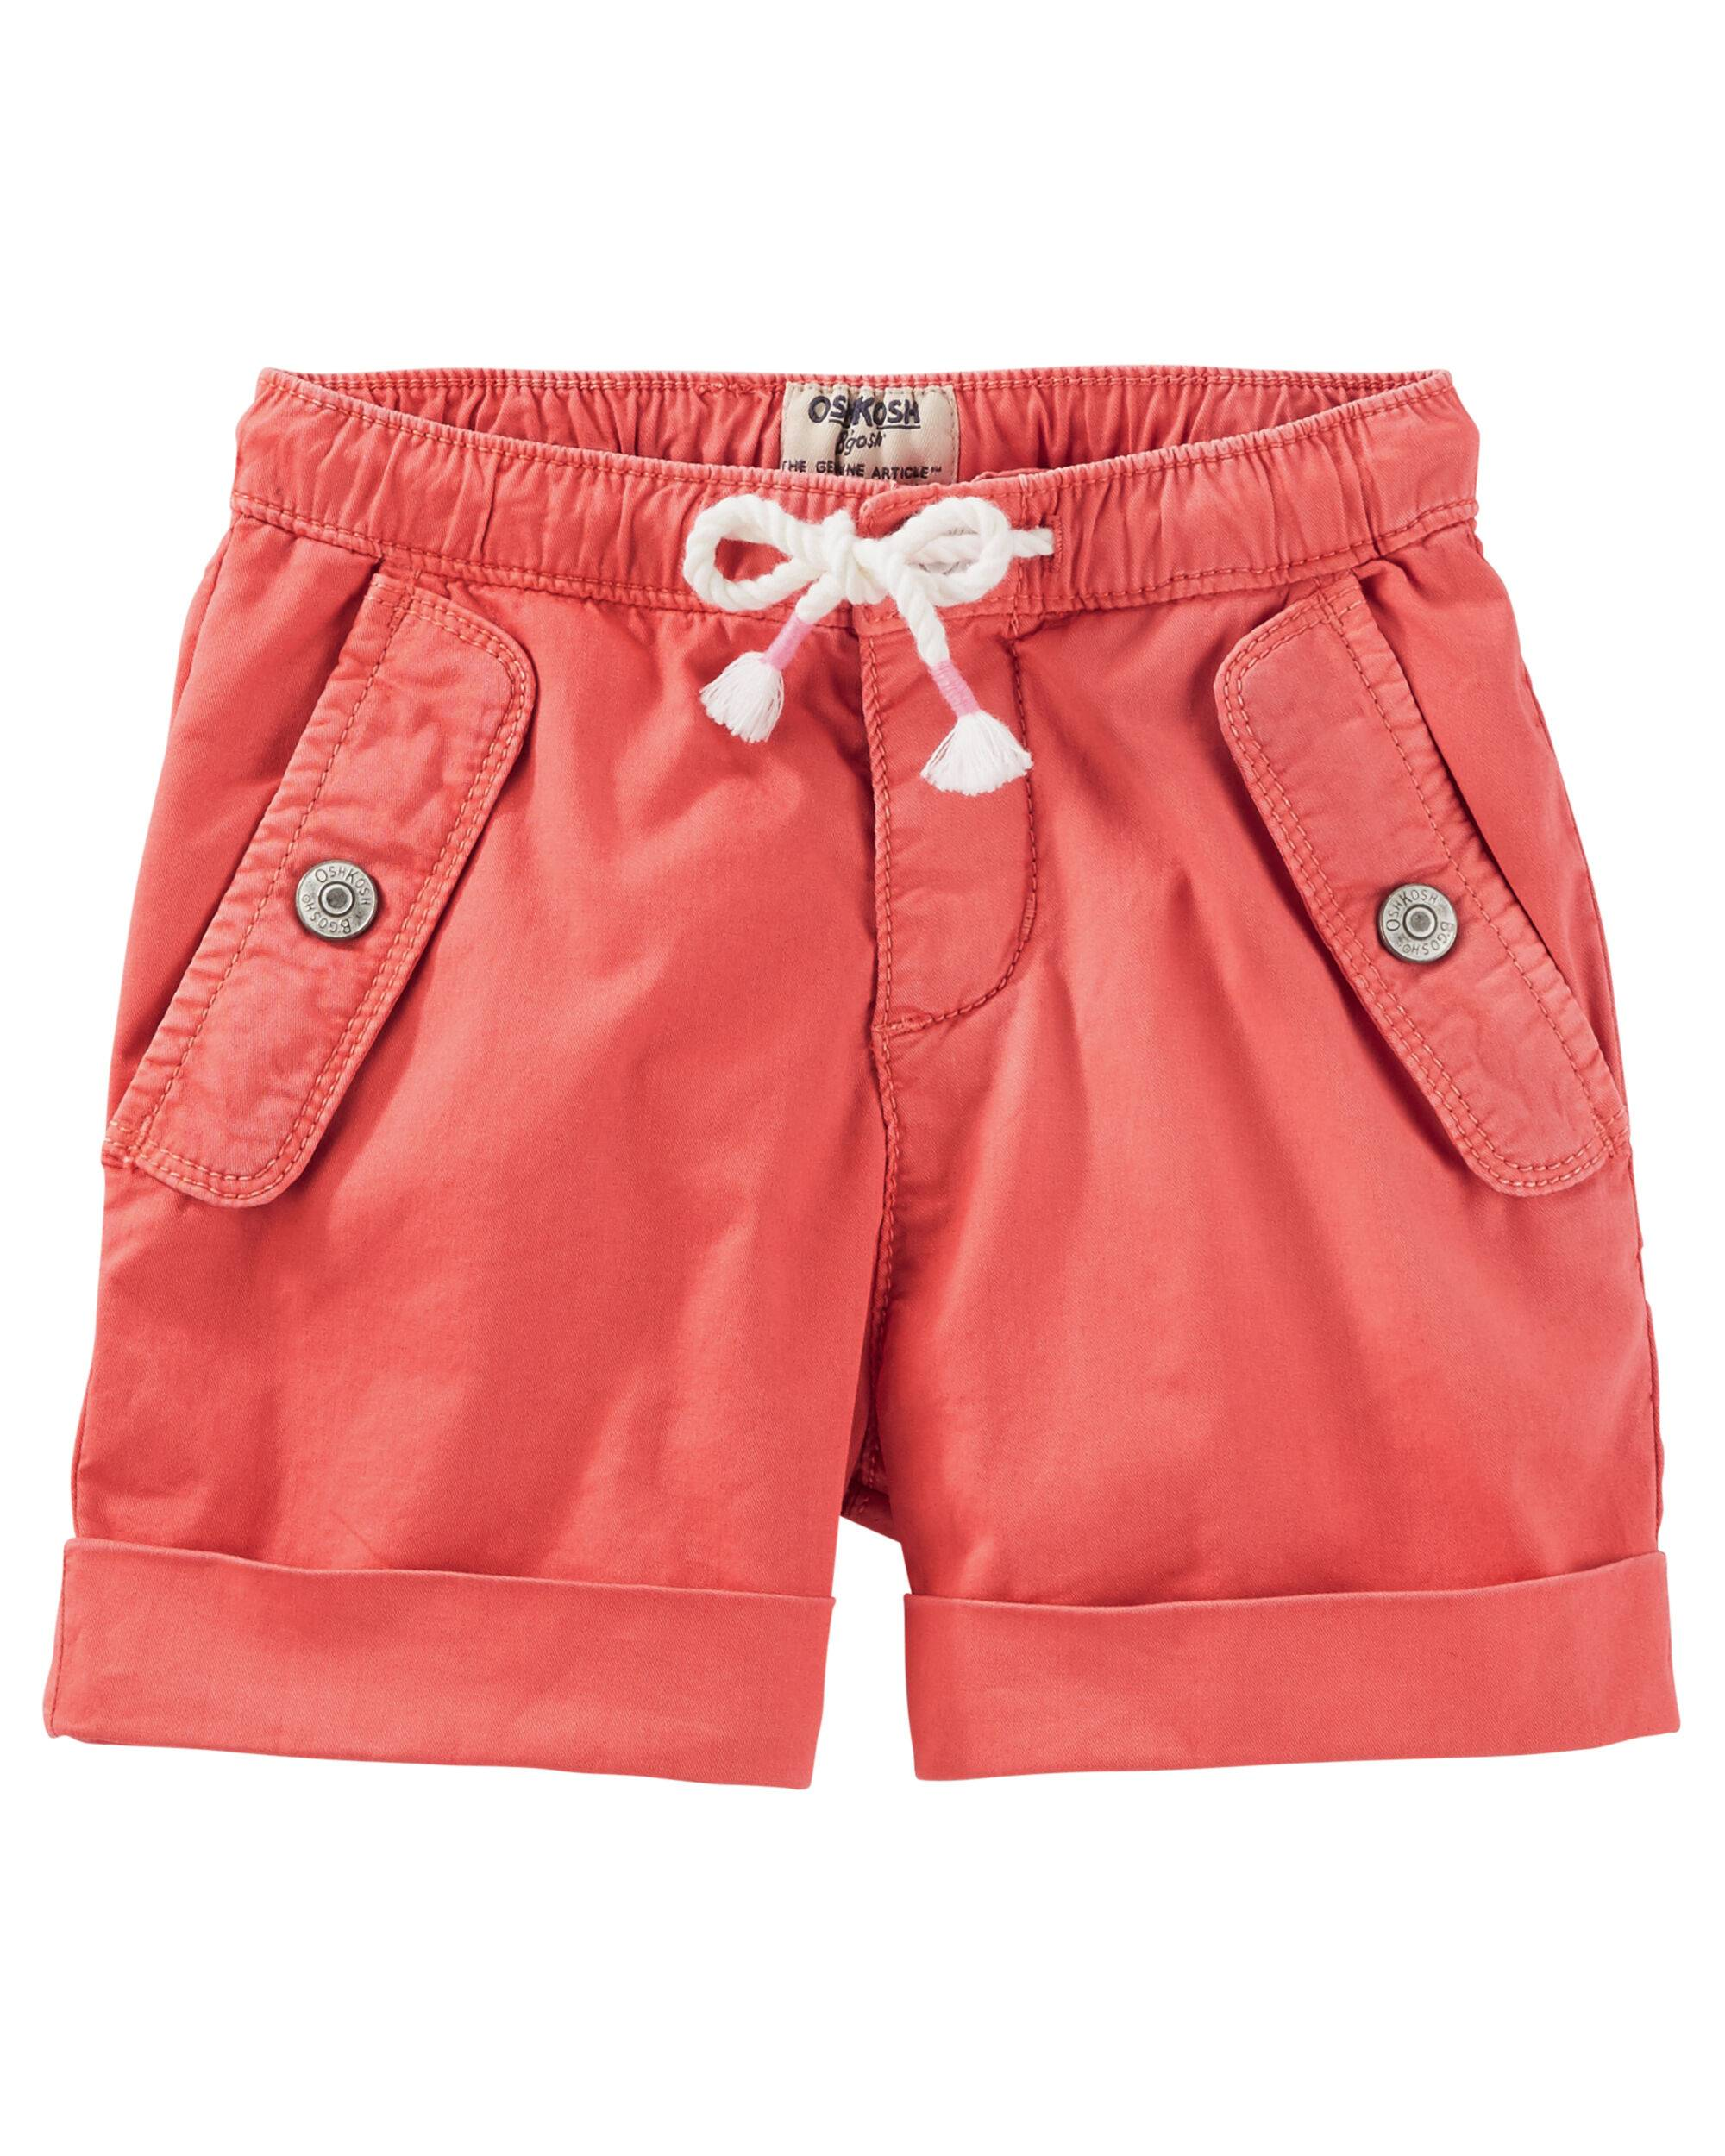 Pull-On Stretch Twill Shorts